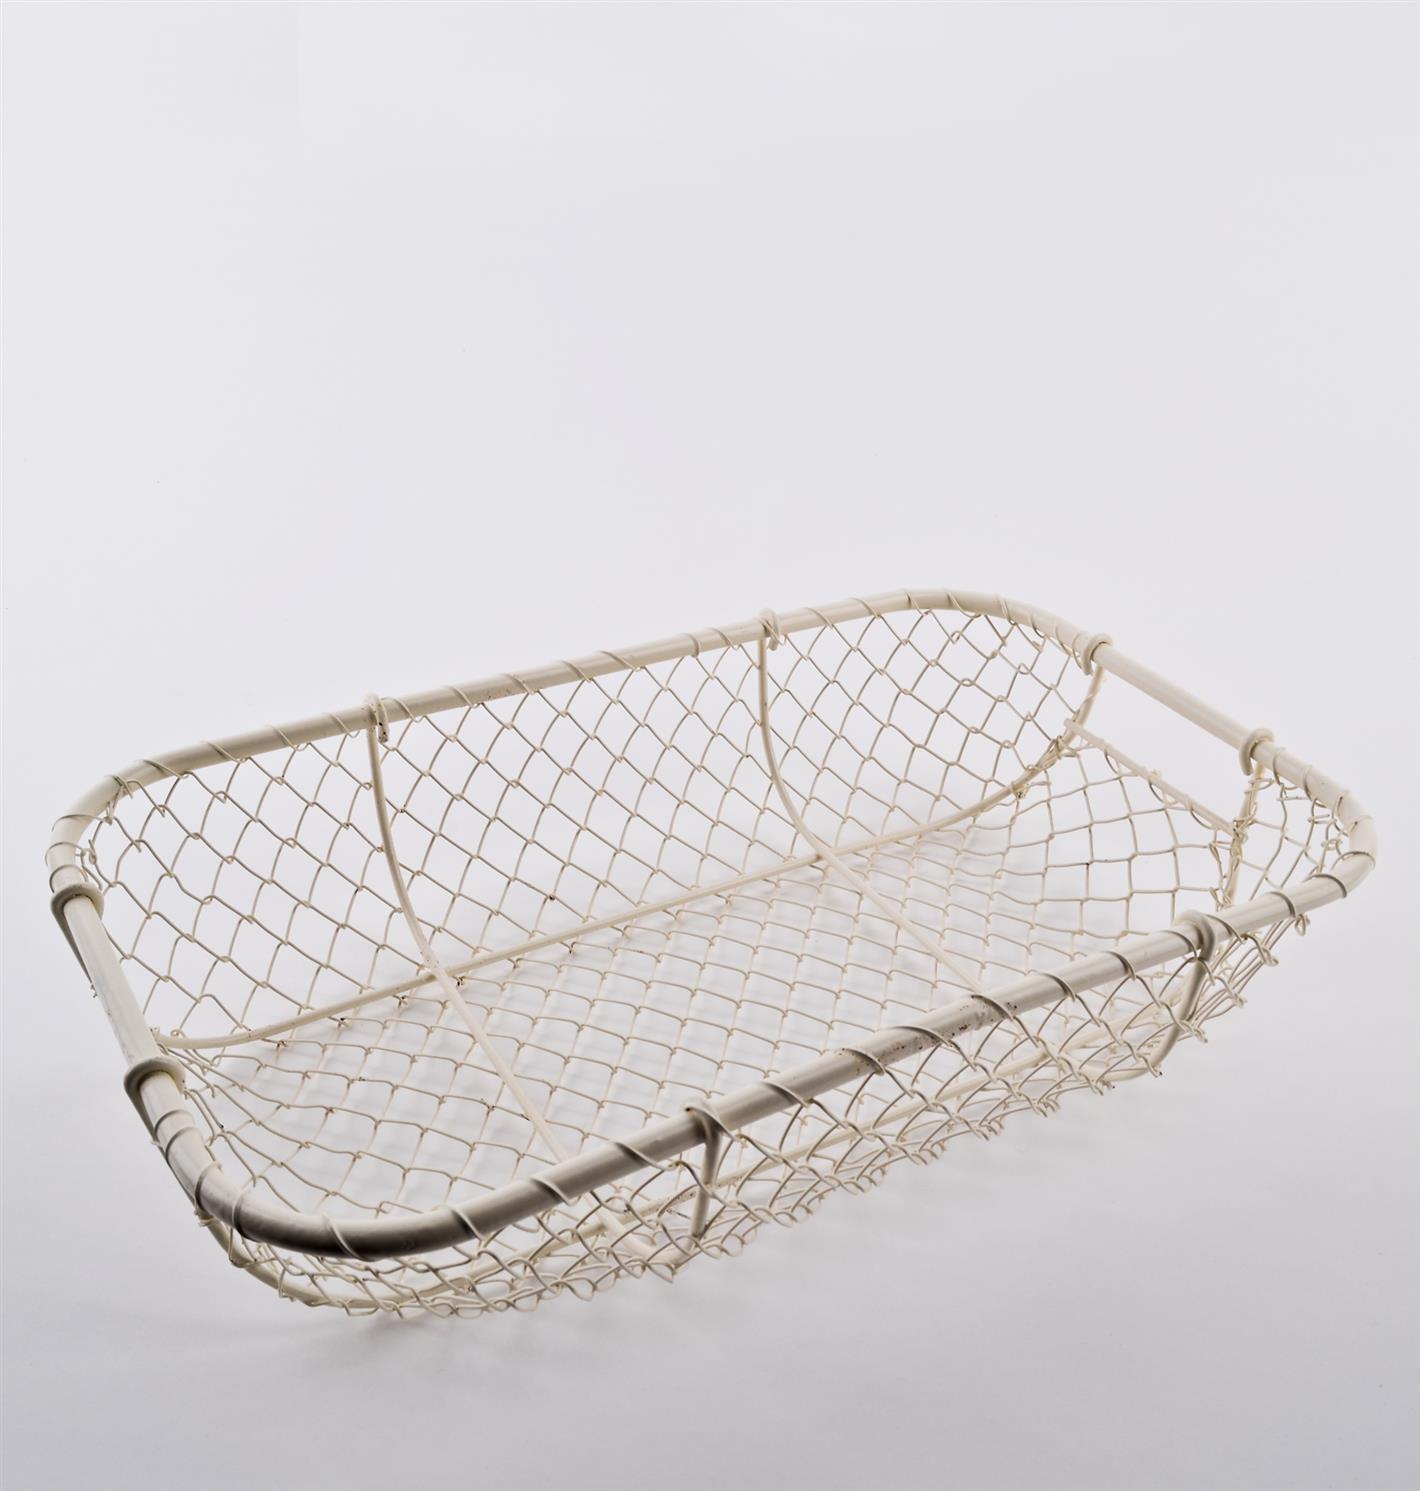 korb draht design metall 38x23cm creme drahtkorb obstkorb metallkorb ebay. Black Bedroom Furniture Sets. Home Design Ideas